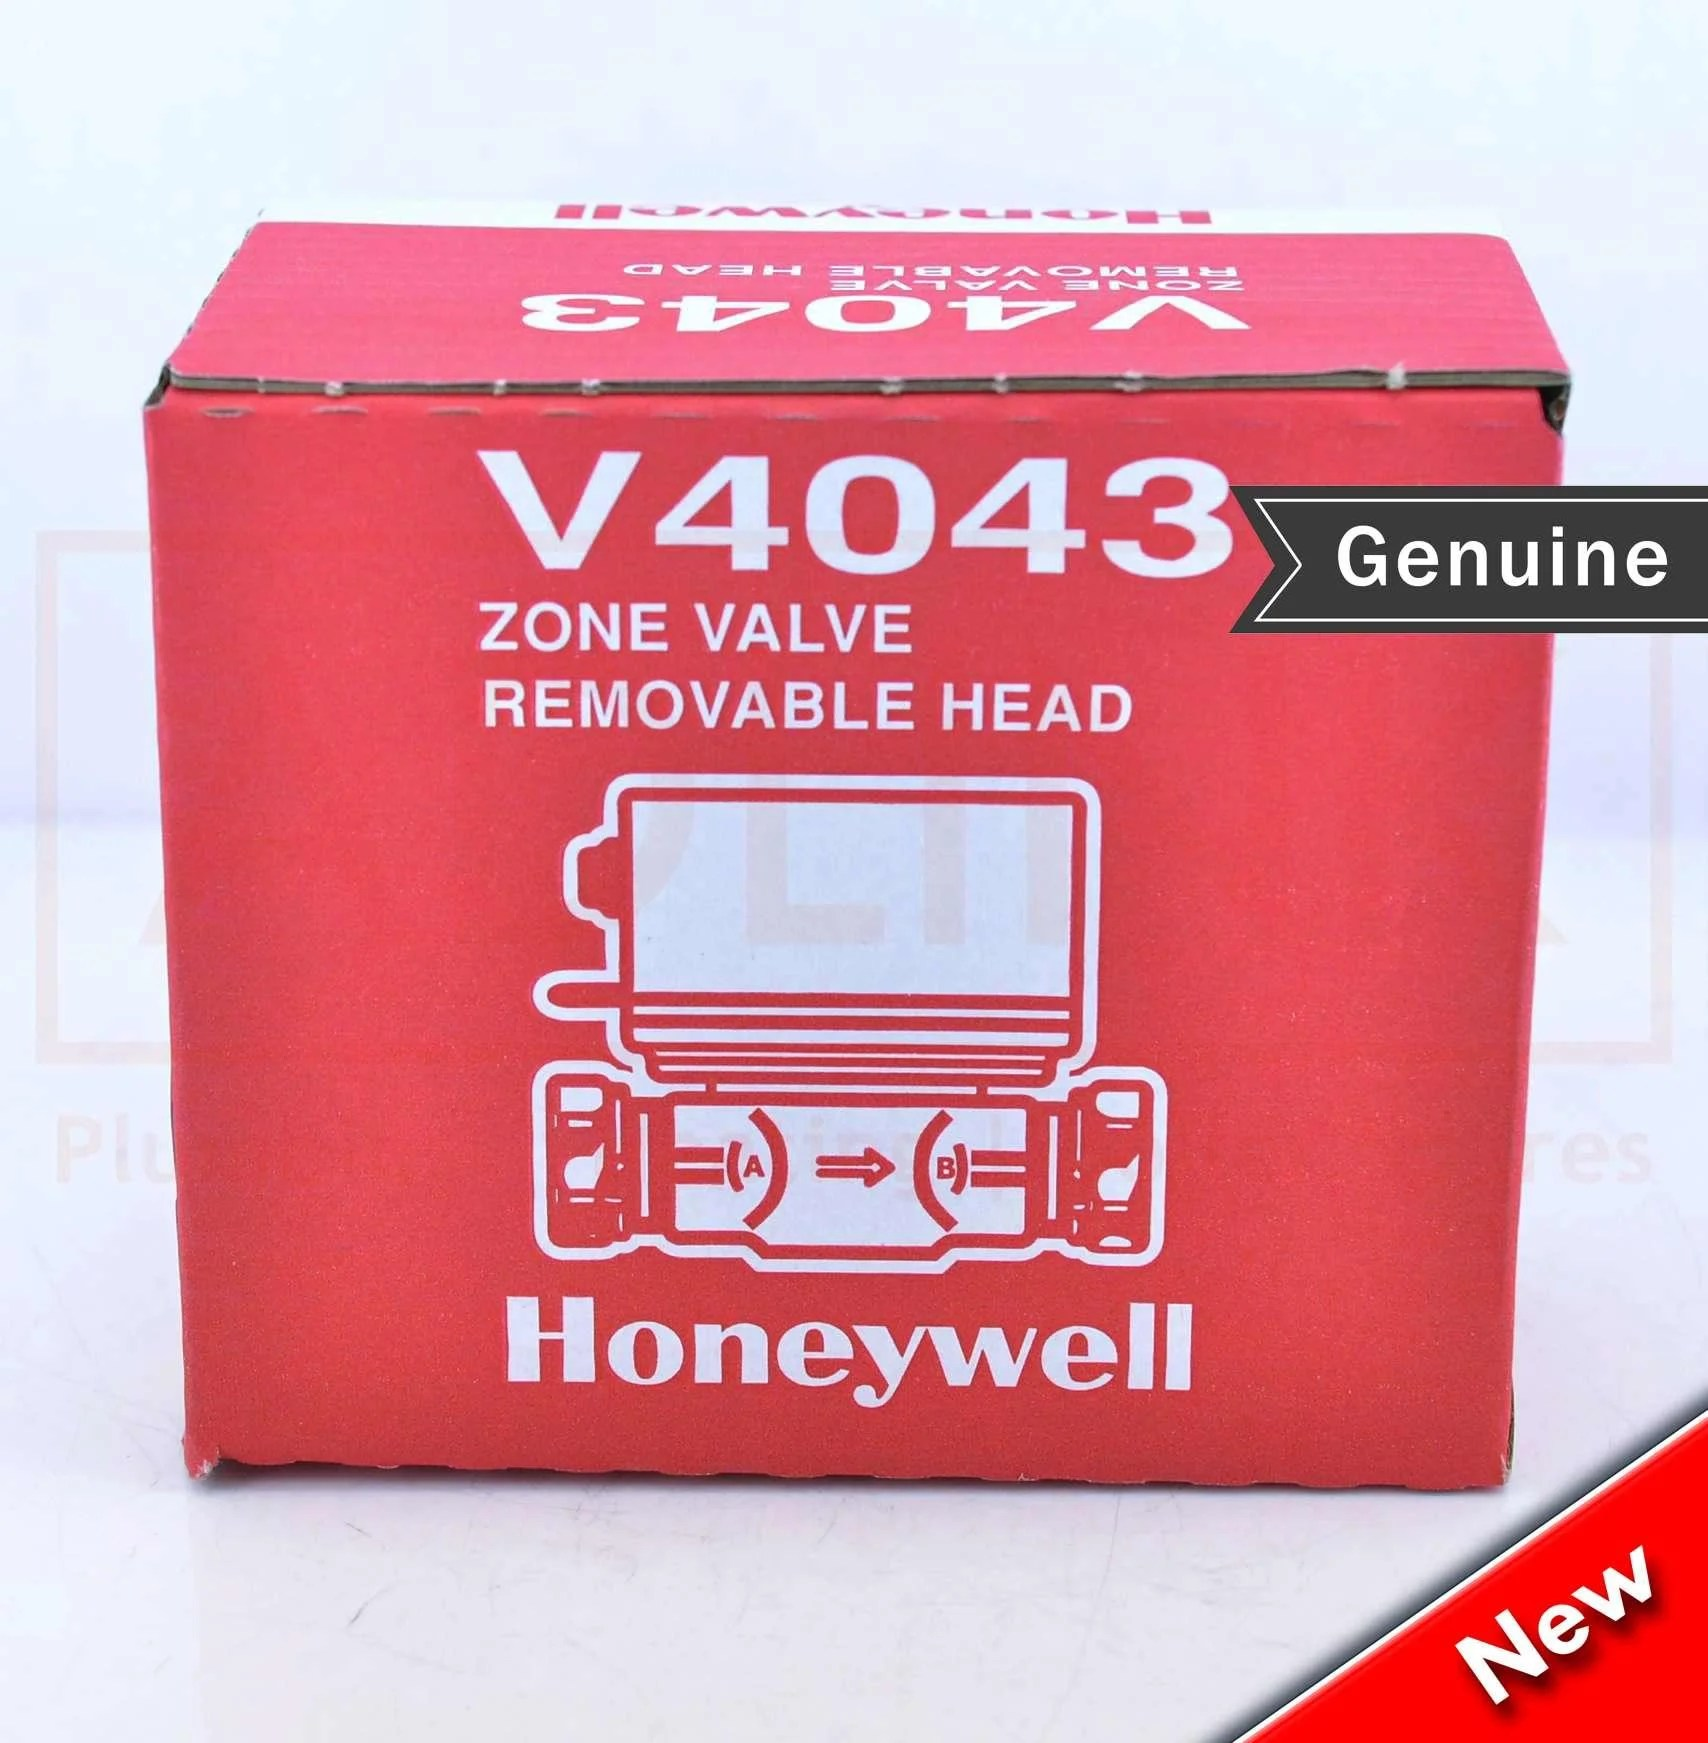 Honeywell 2 Port Zone Valve 22mm 5 Wire V H